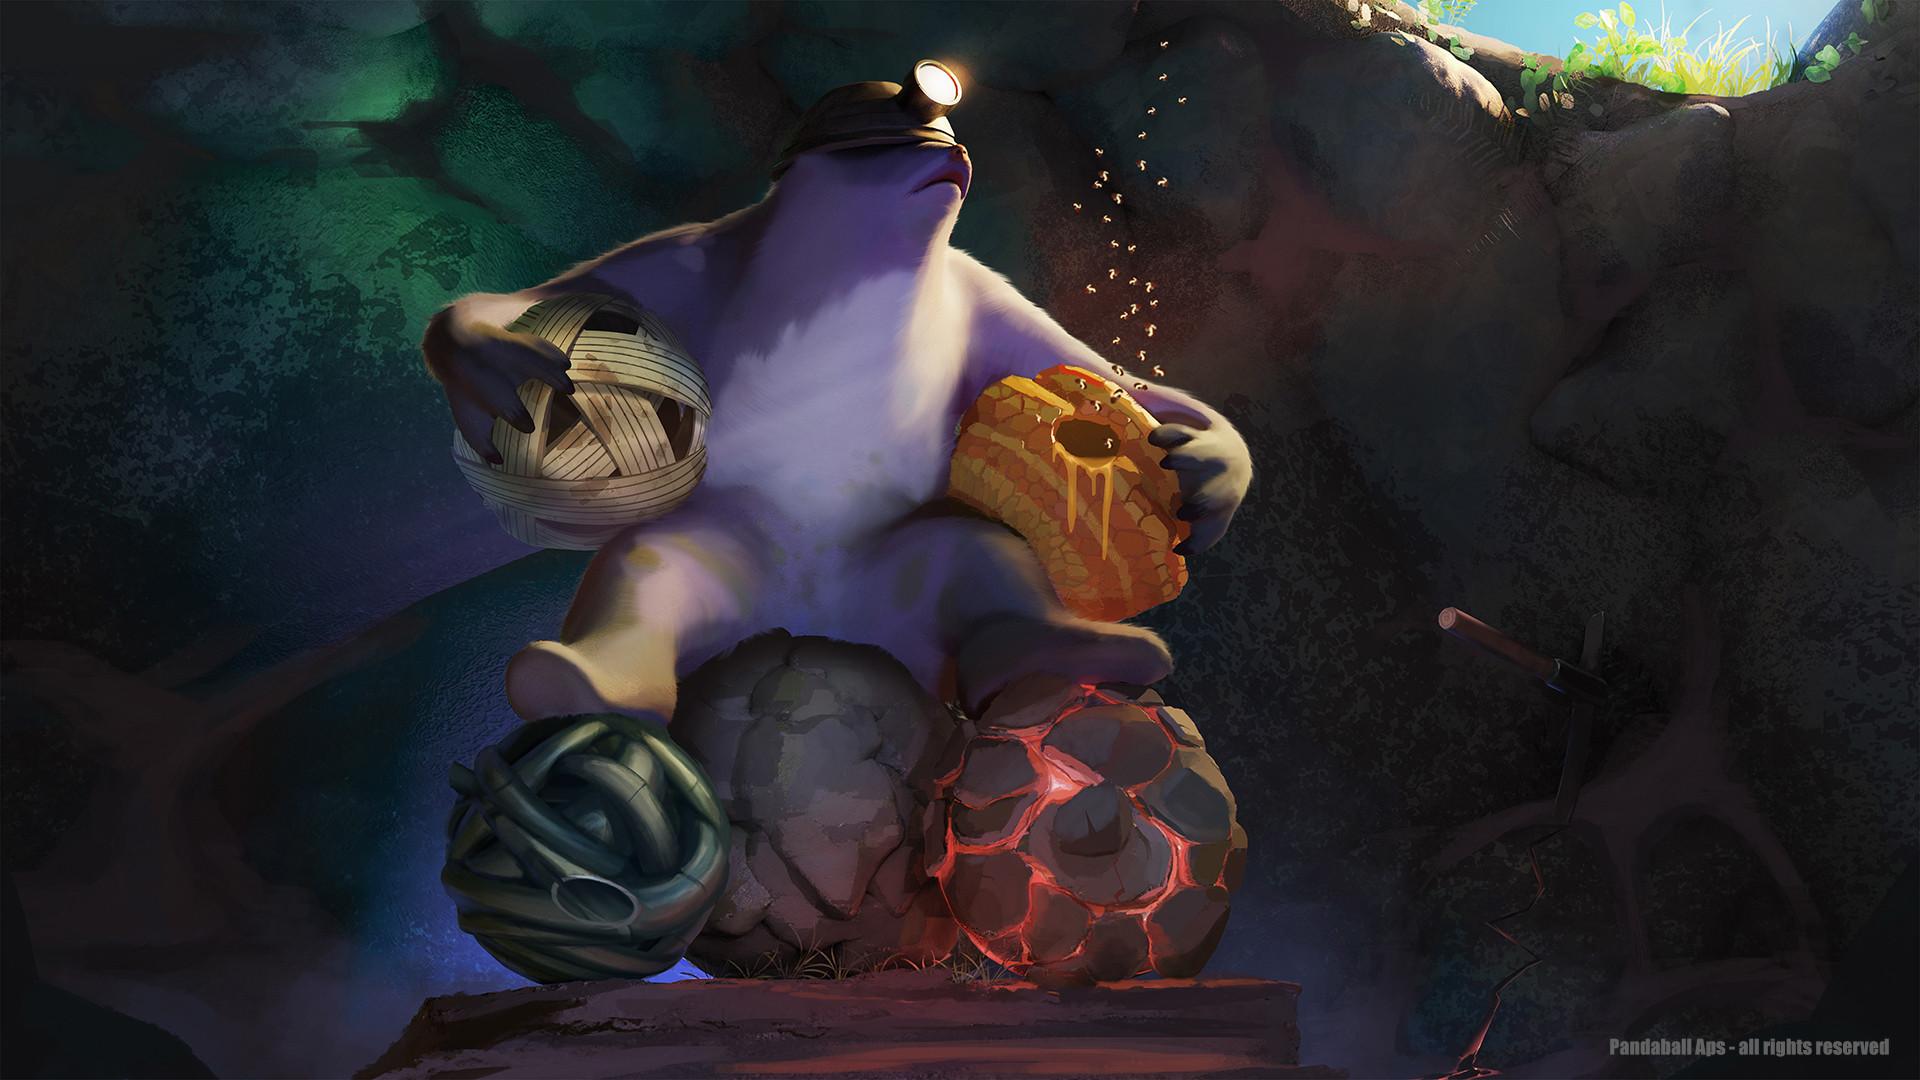 Pandaball Ballboy